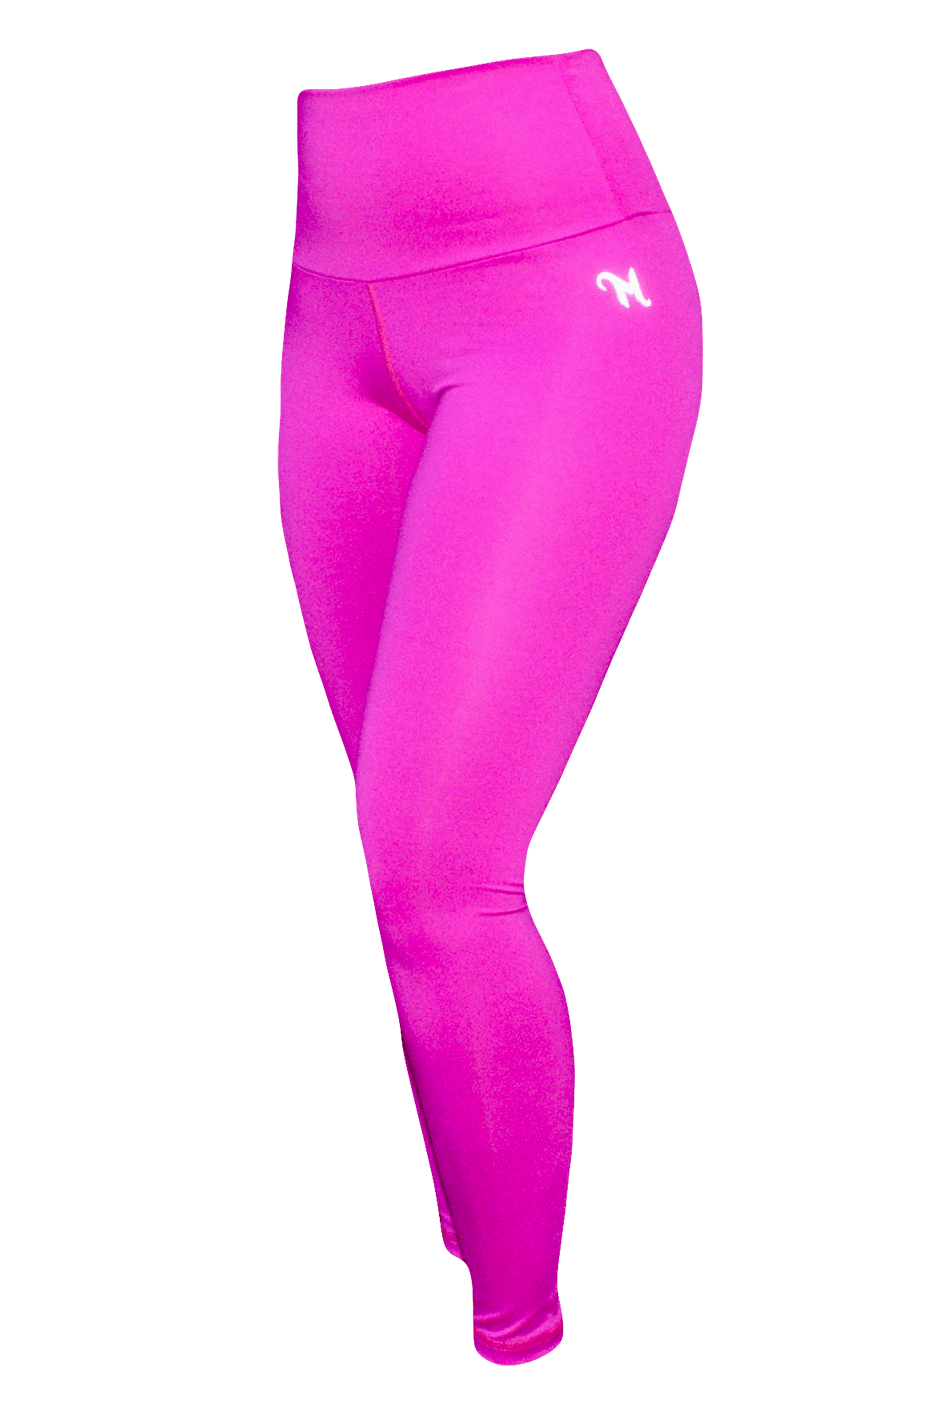 shaper pink 2-Mfit